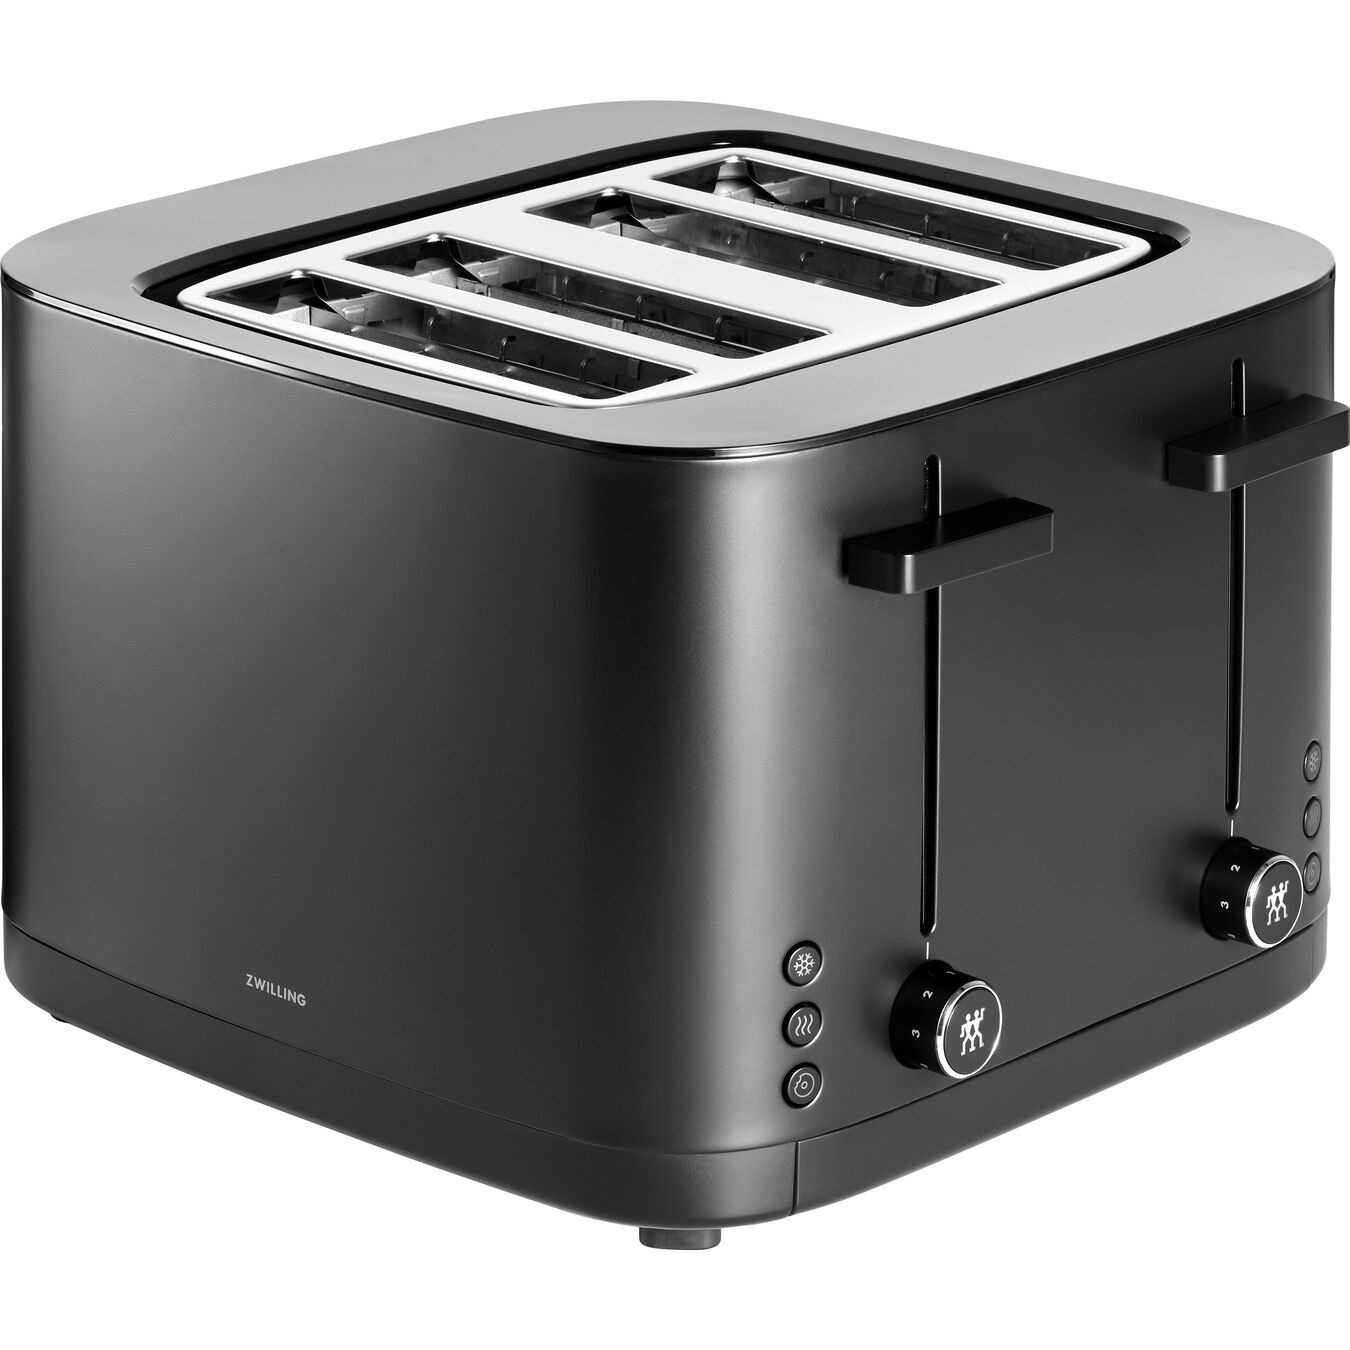 4 Slot Toaster - Black,,large 1